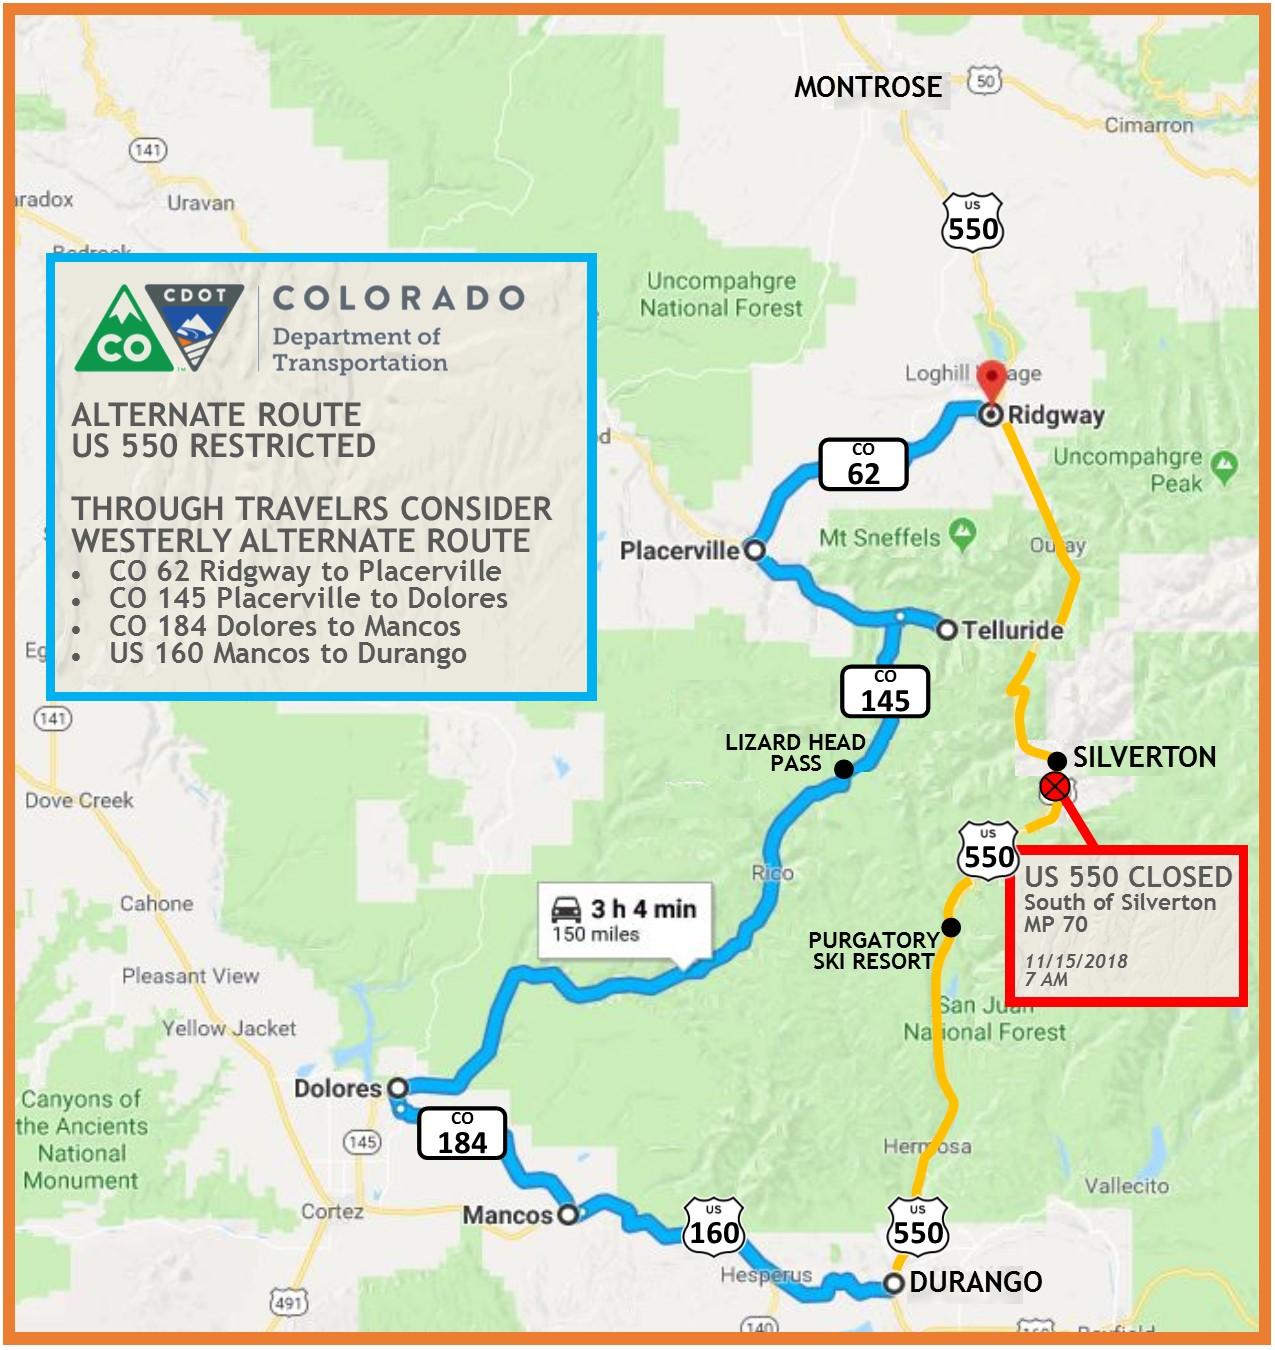 US 550 Alternate Route.jpg detail image